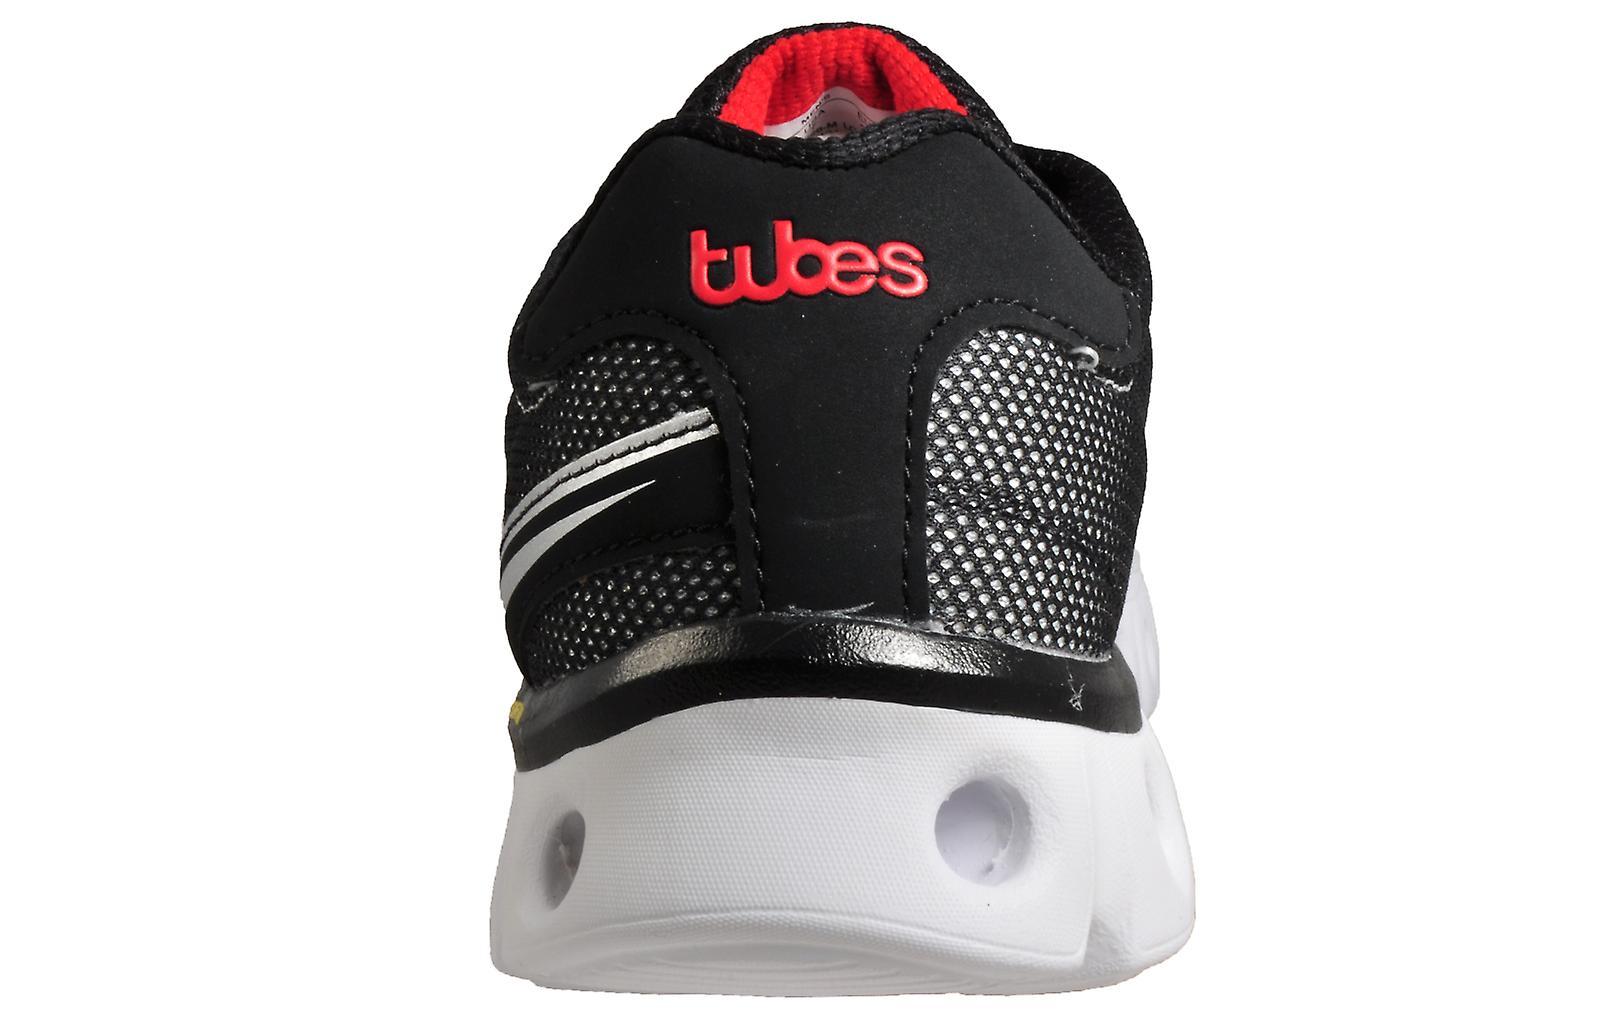 K Swiss Tubes X Lite Memory Foam Black/White/Red